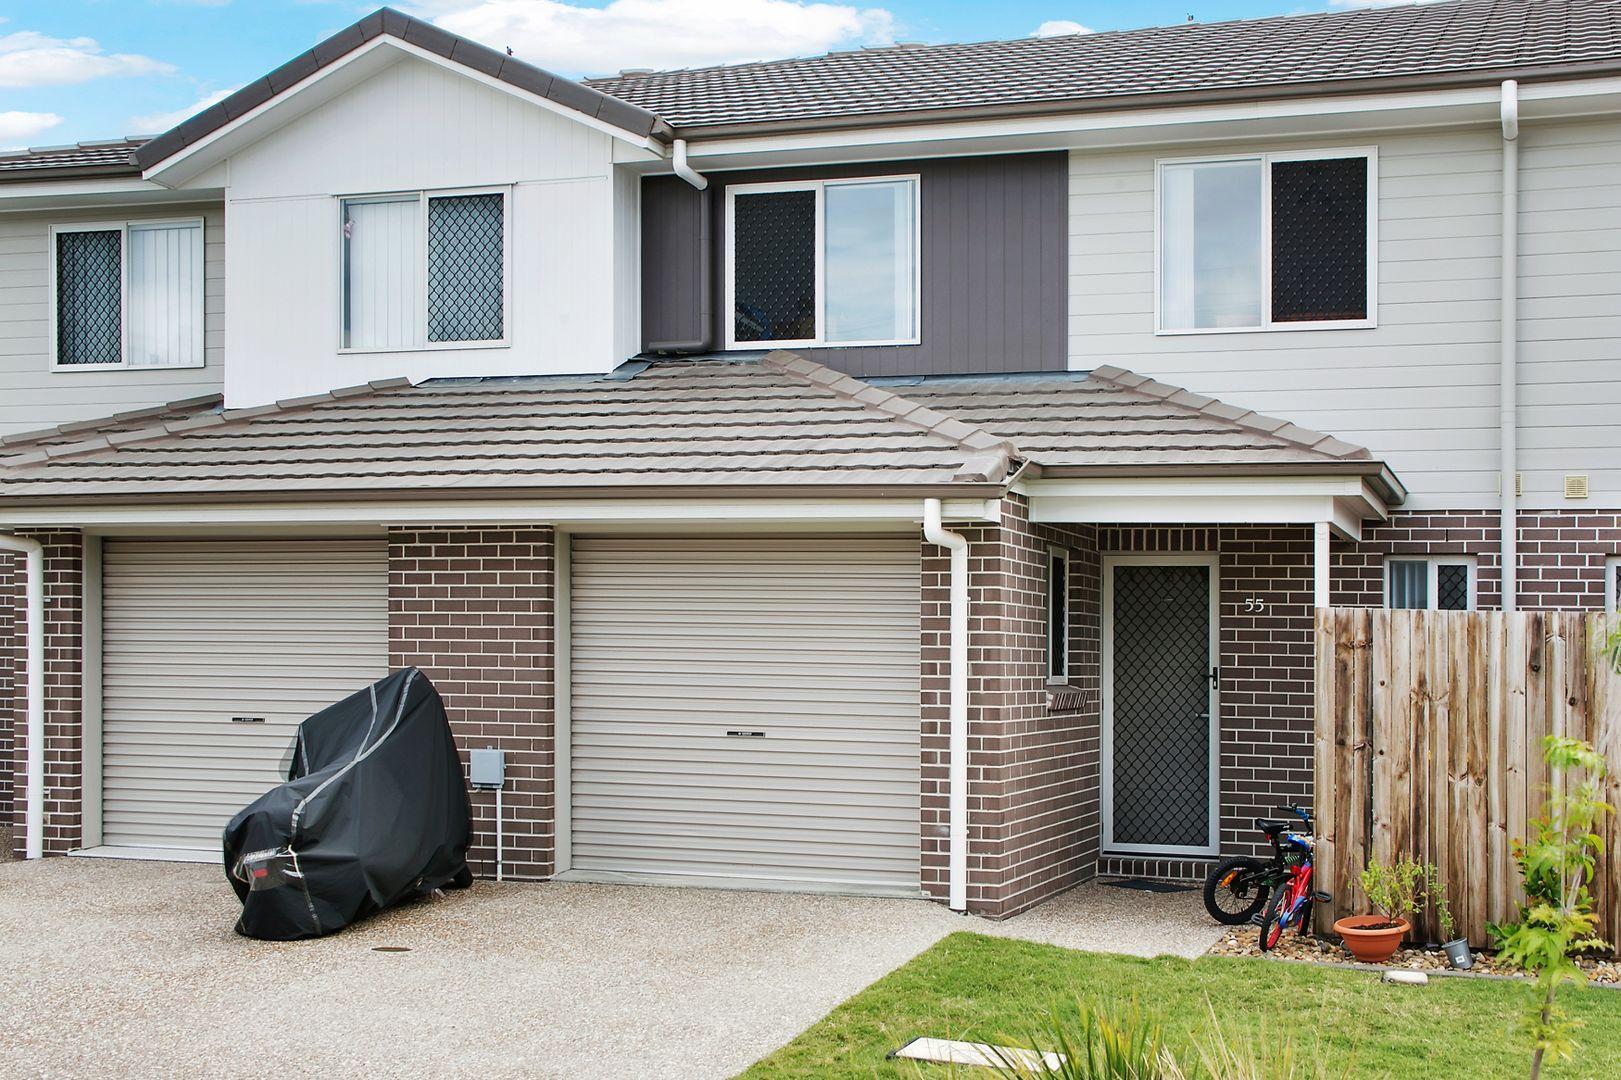 55/80 Coora Street, Wishart QLD 4122, Image 0